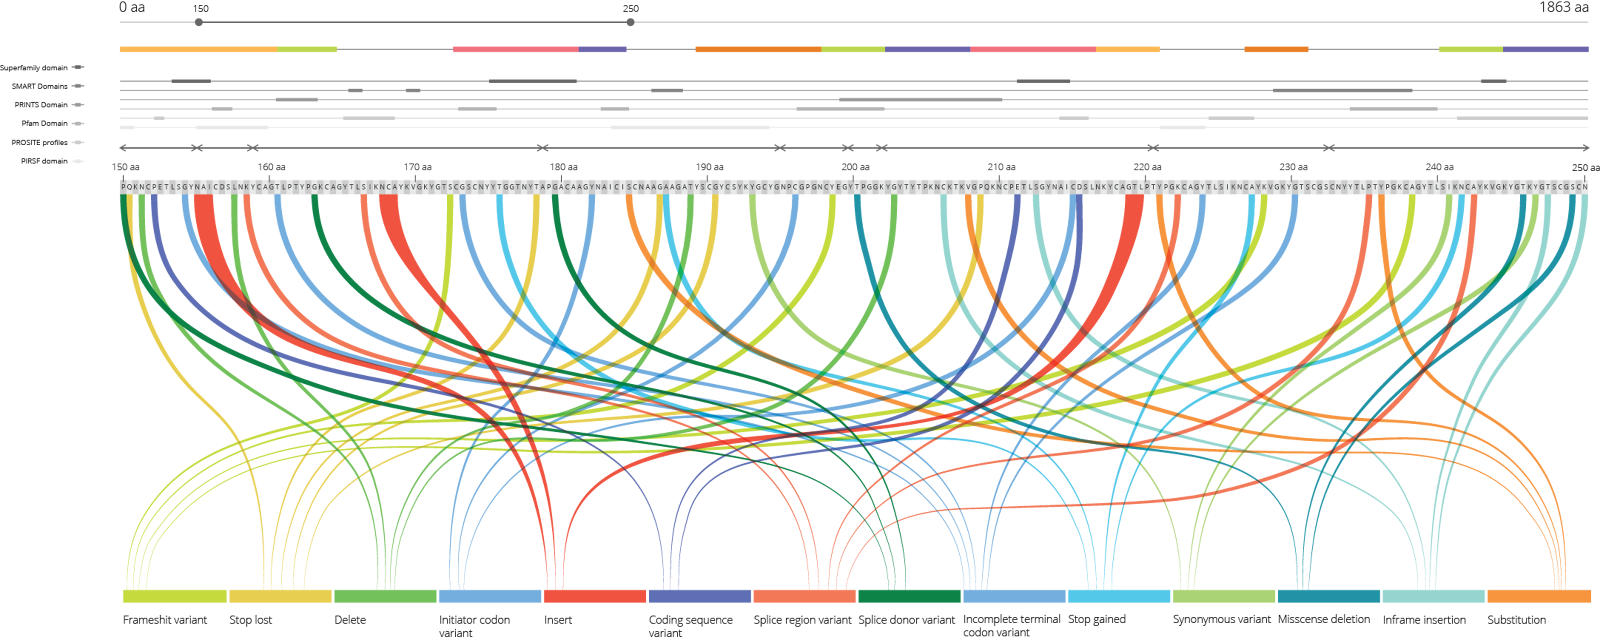 Illustrator static prototype with fake data